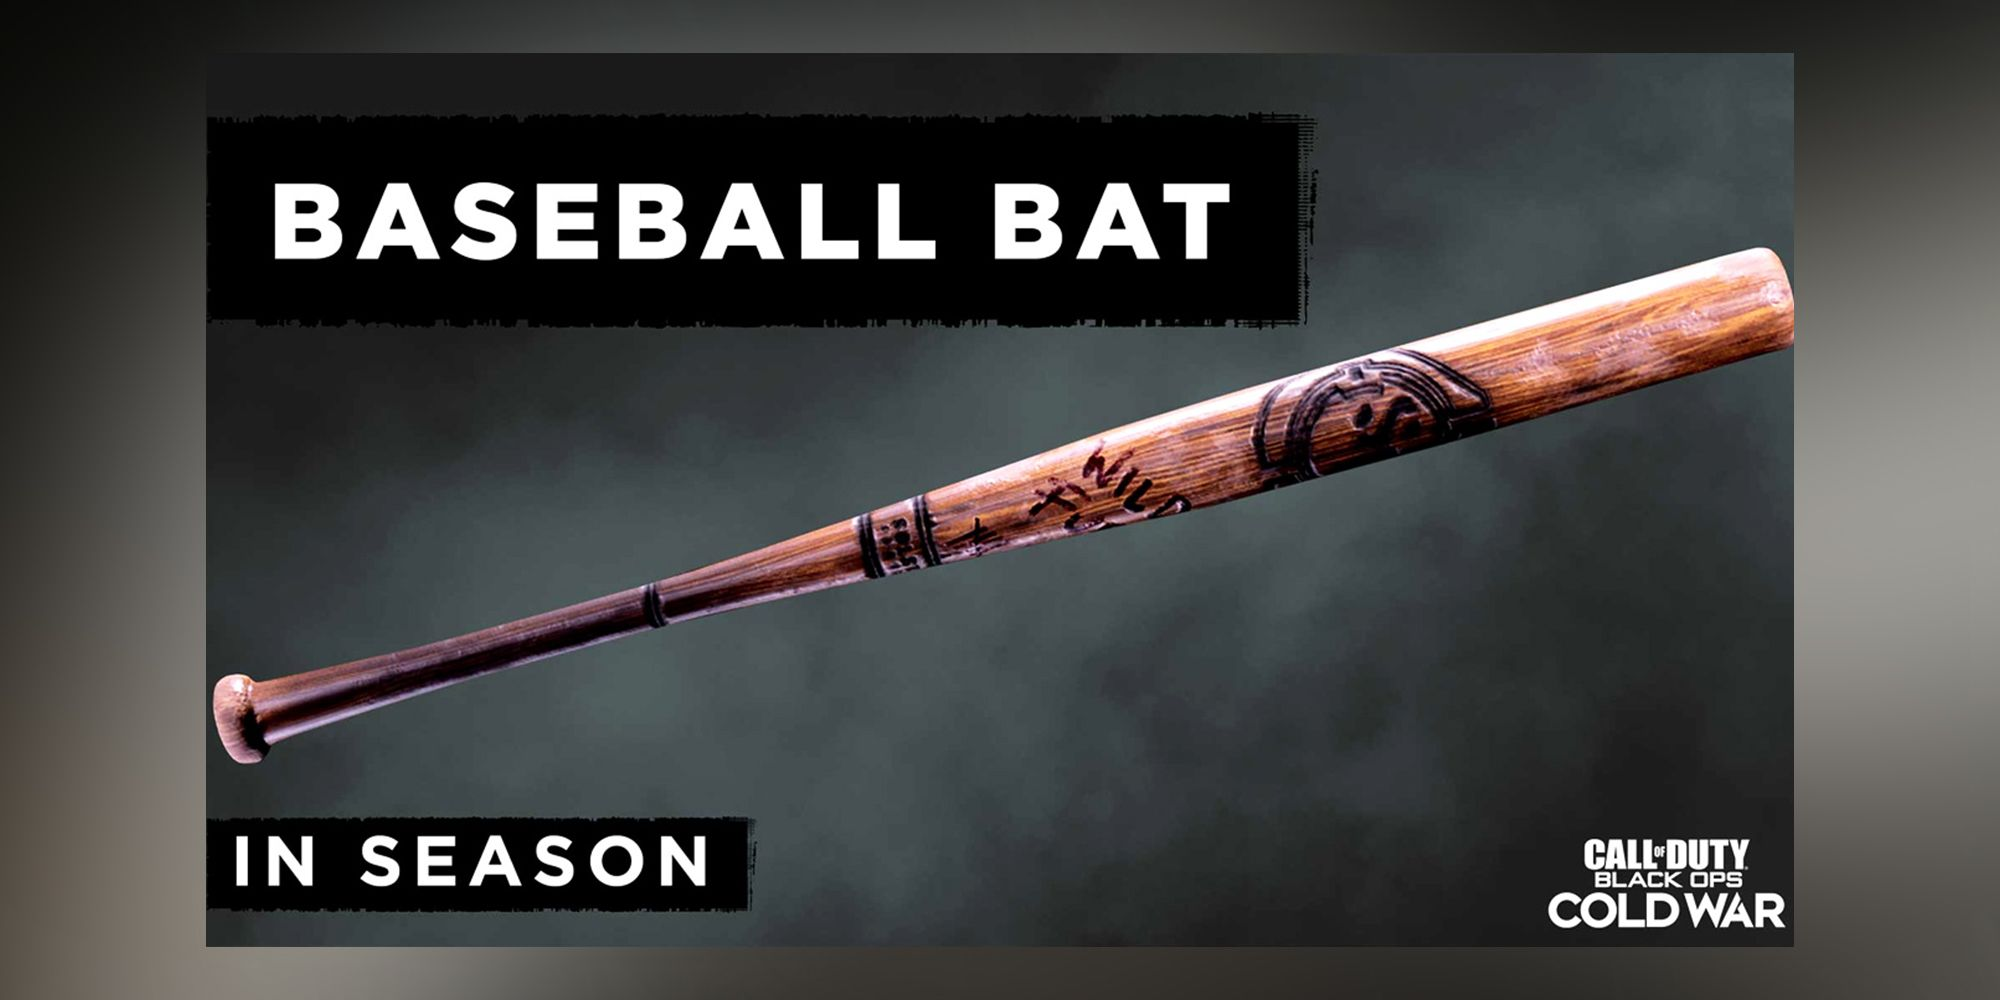 How To Unlock The Baseball Bat In Call Of Duty Cold War Season 3